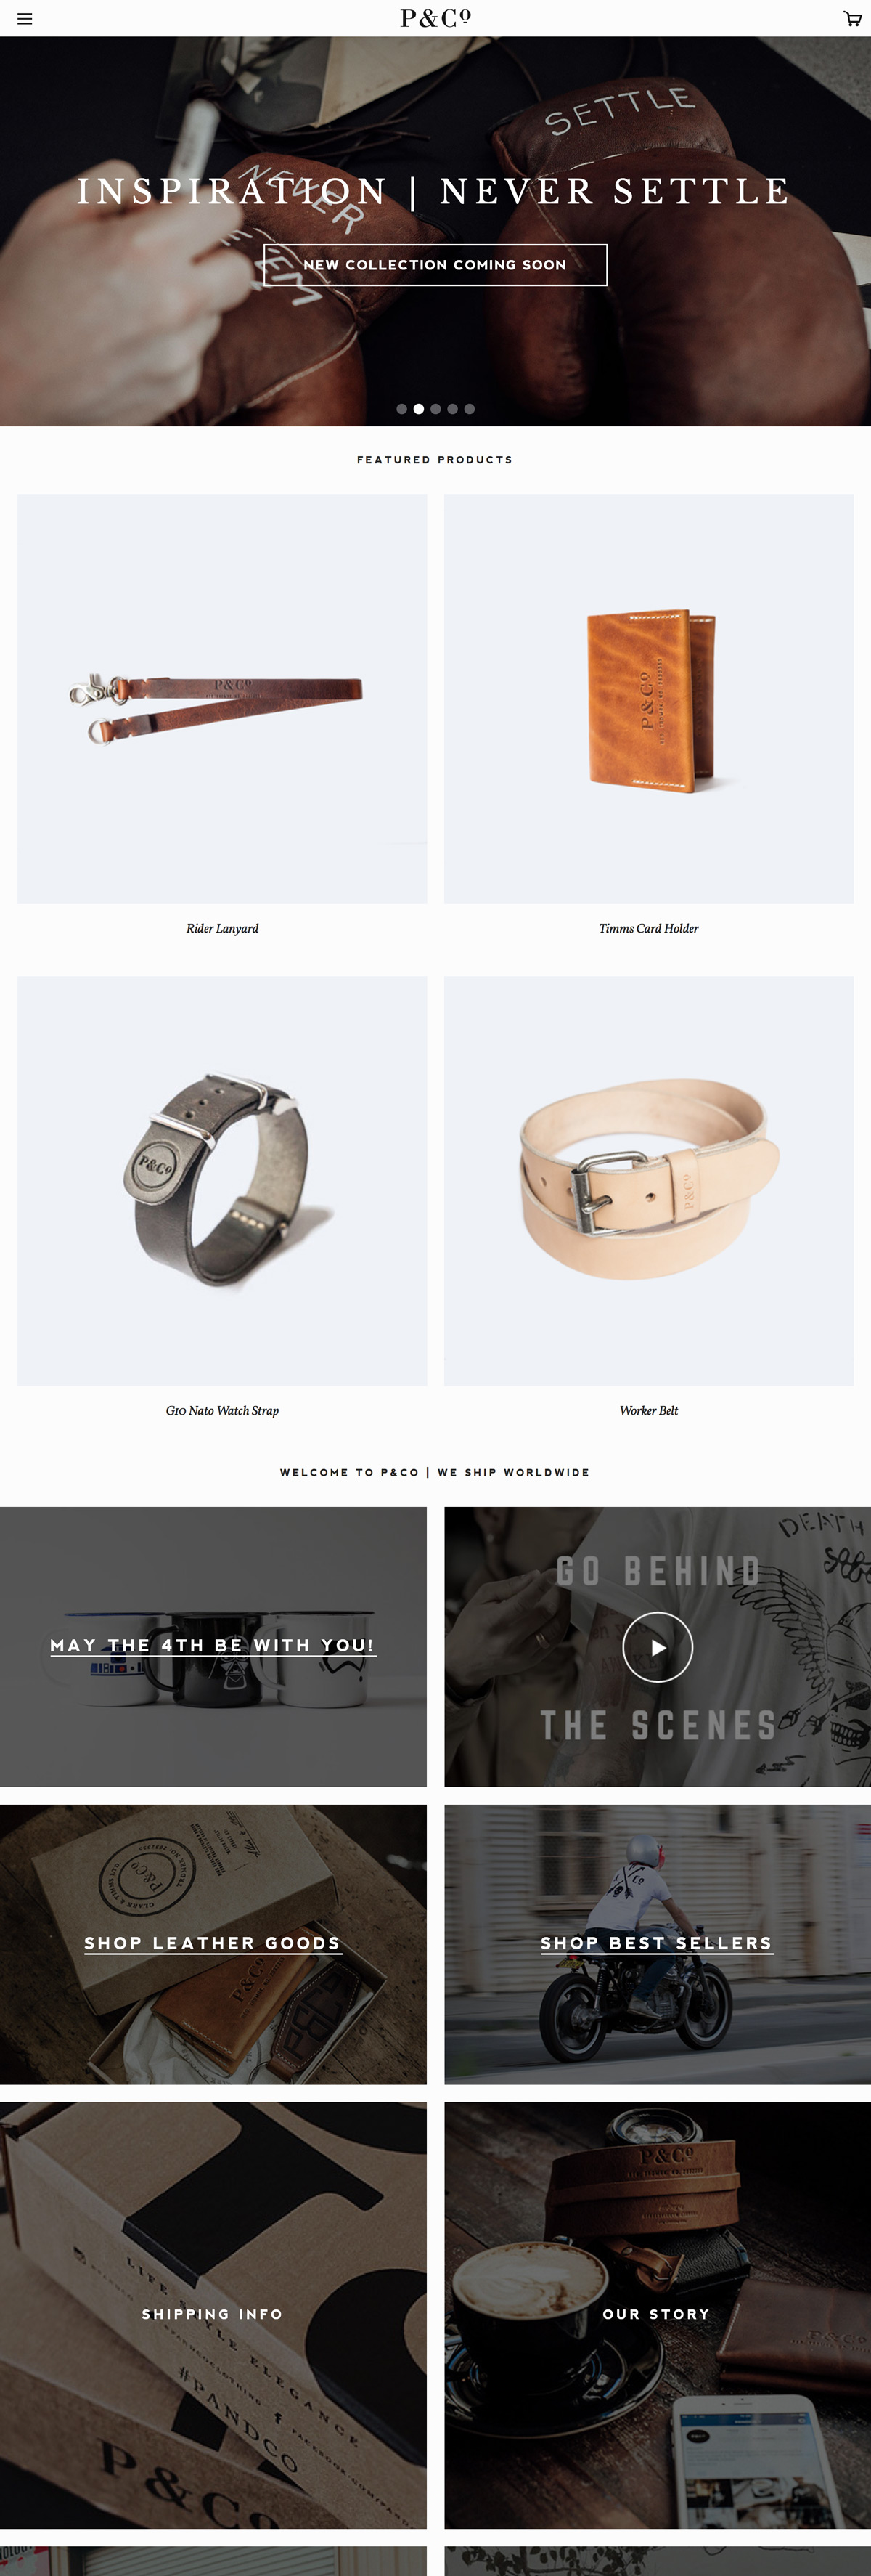 eCommerce website: P & Co.